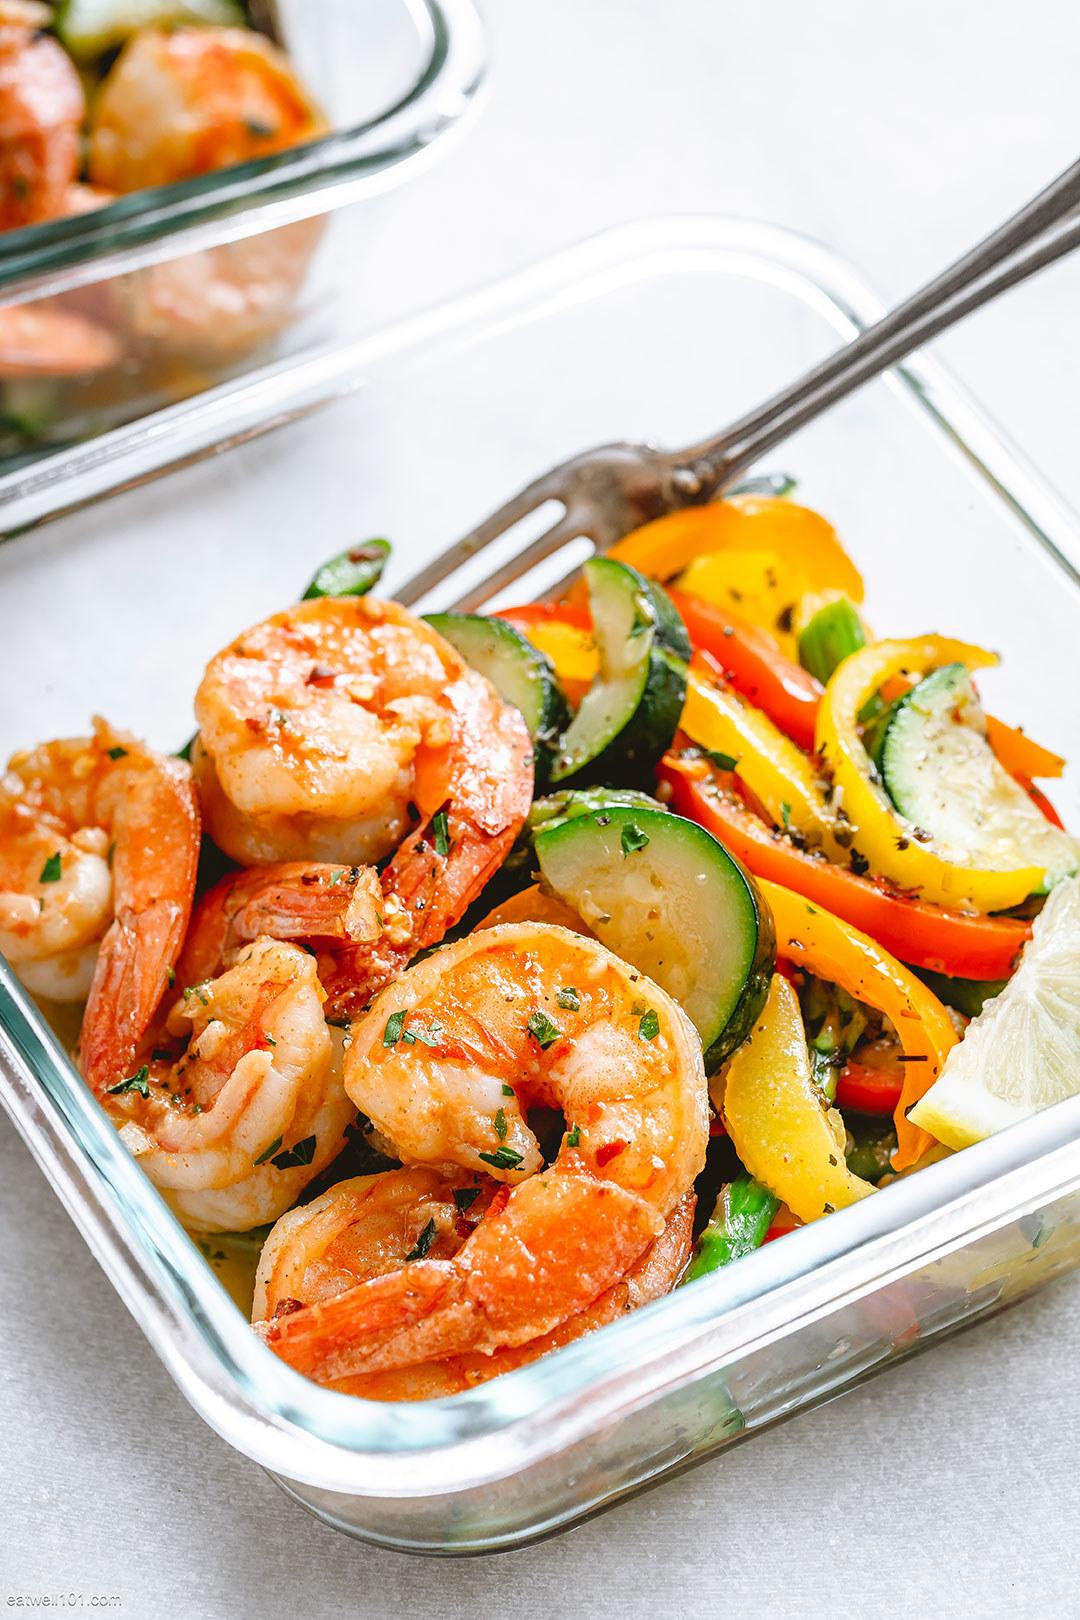 Cajun shrimp with vegetables meal prep.